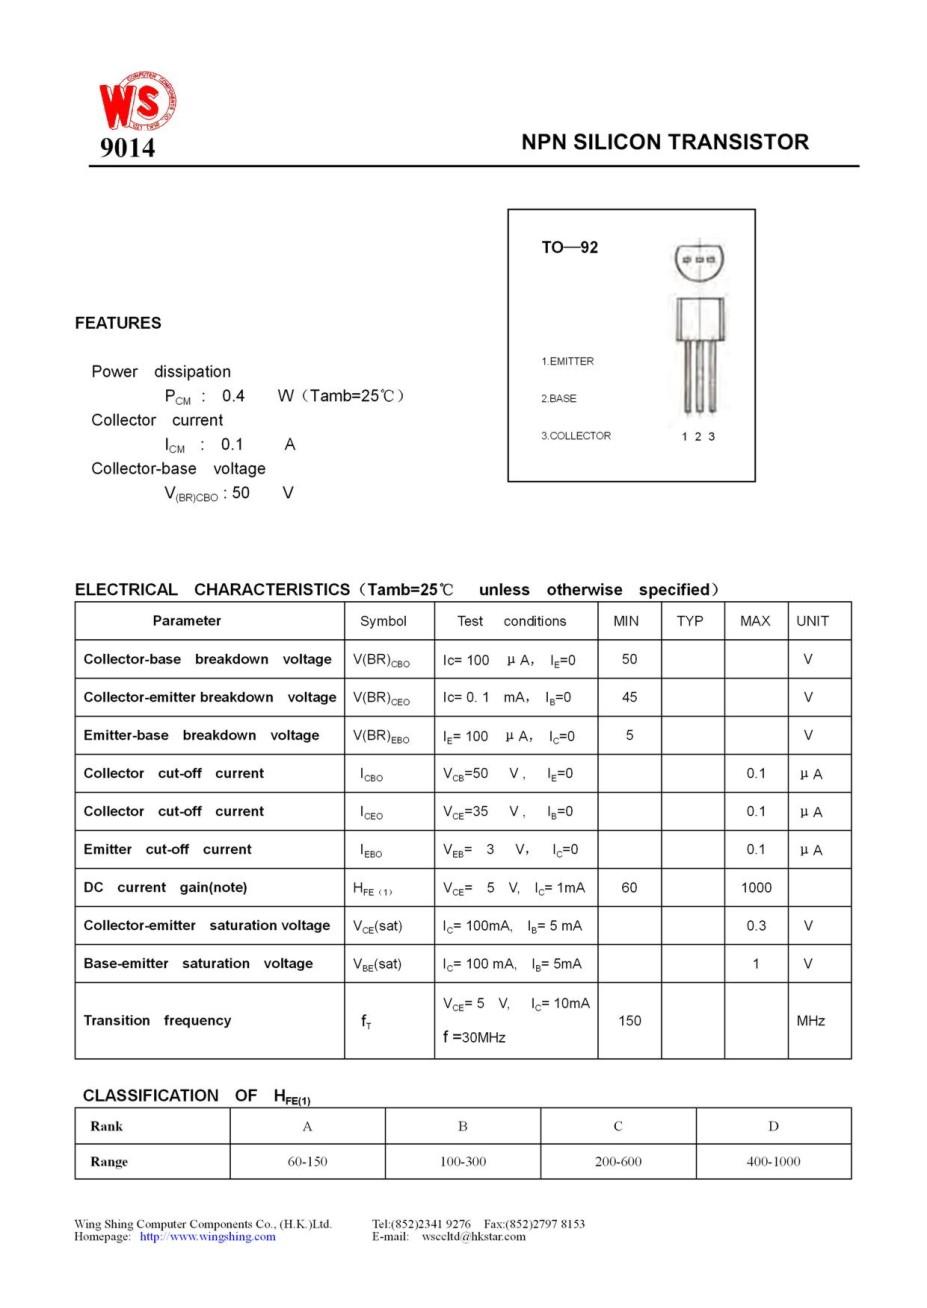 novo-1 Datasheet Of Transistor on 2n3906 pnp, 2n2219a, current emittor 2n2222, npn 2222a, s8050 d331, 2n444a germanium,